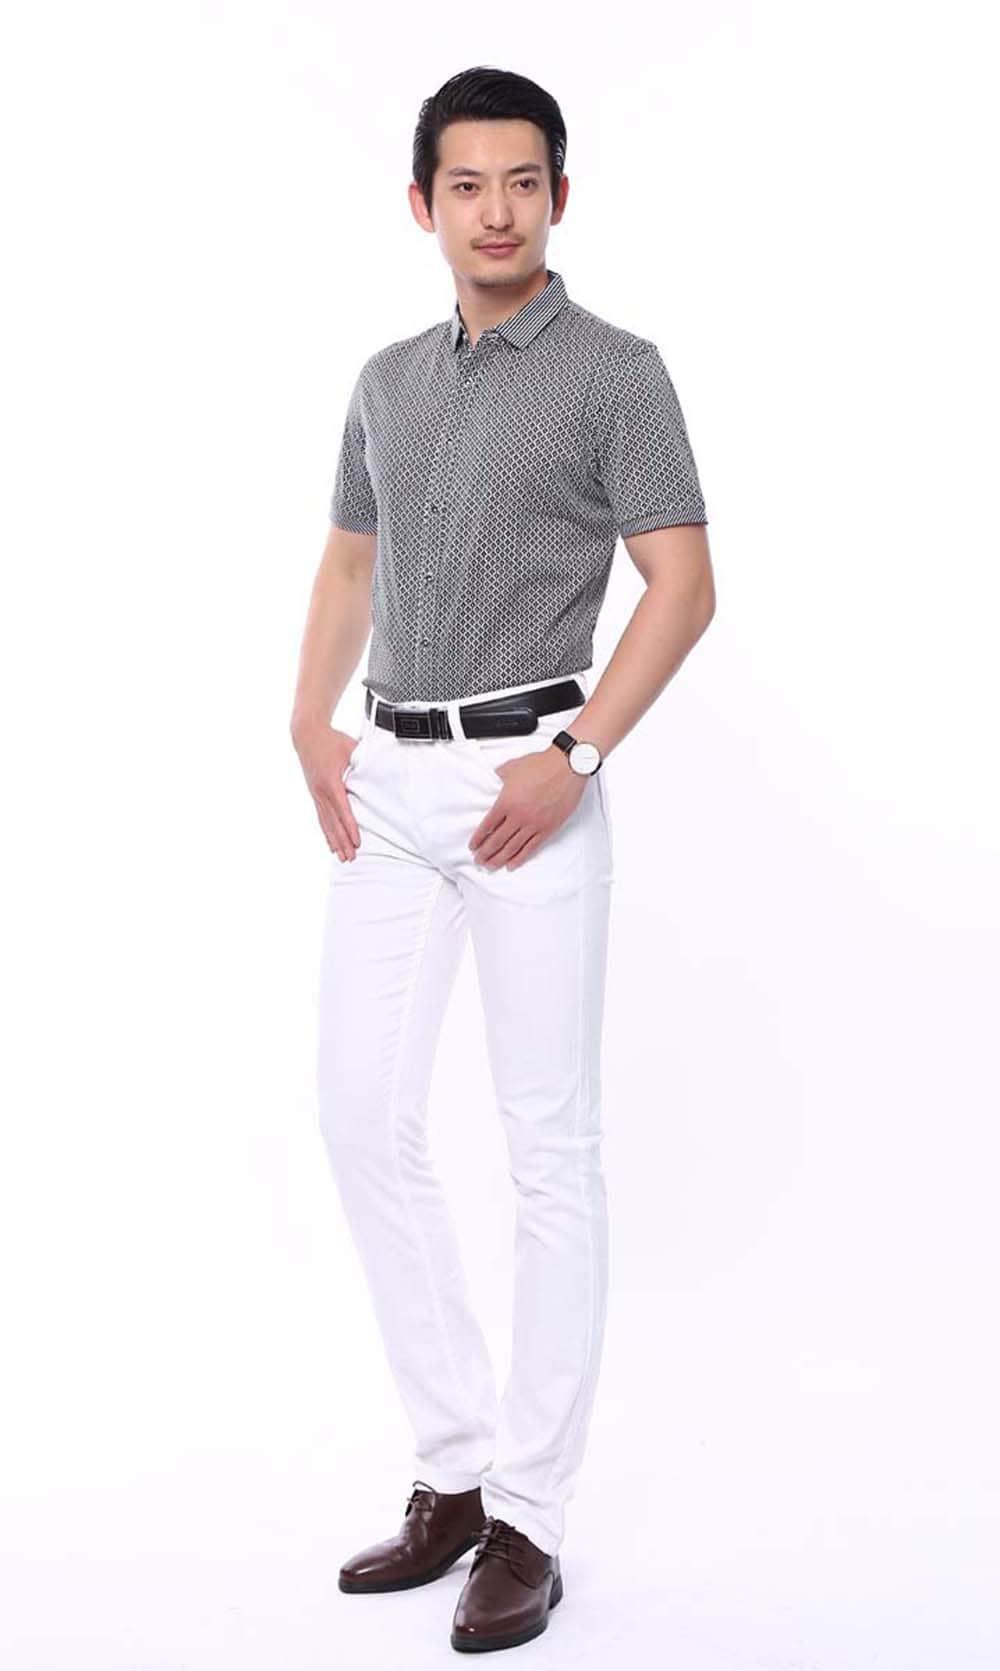 plaid shirts business casual photo - 1